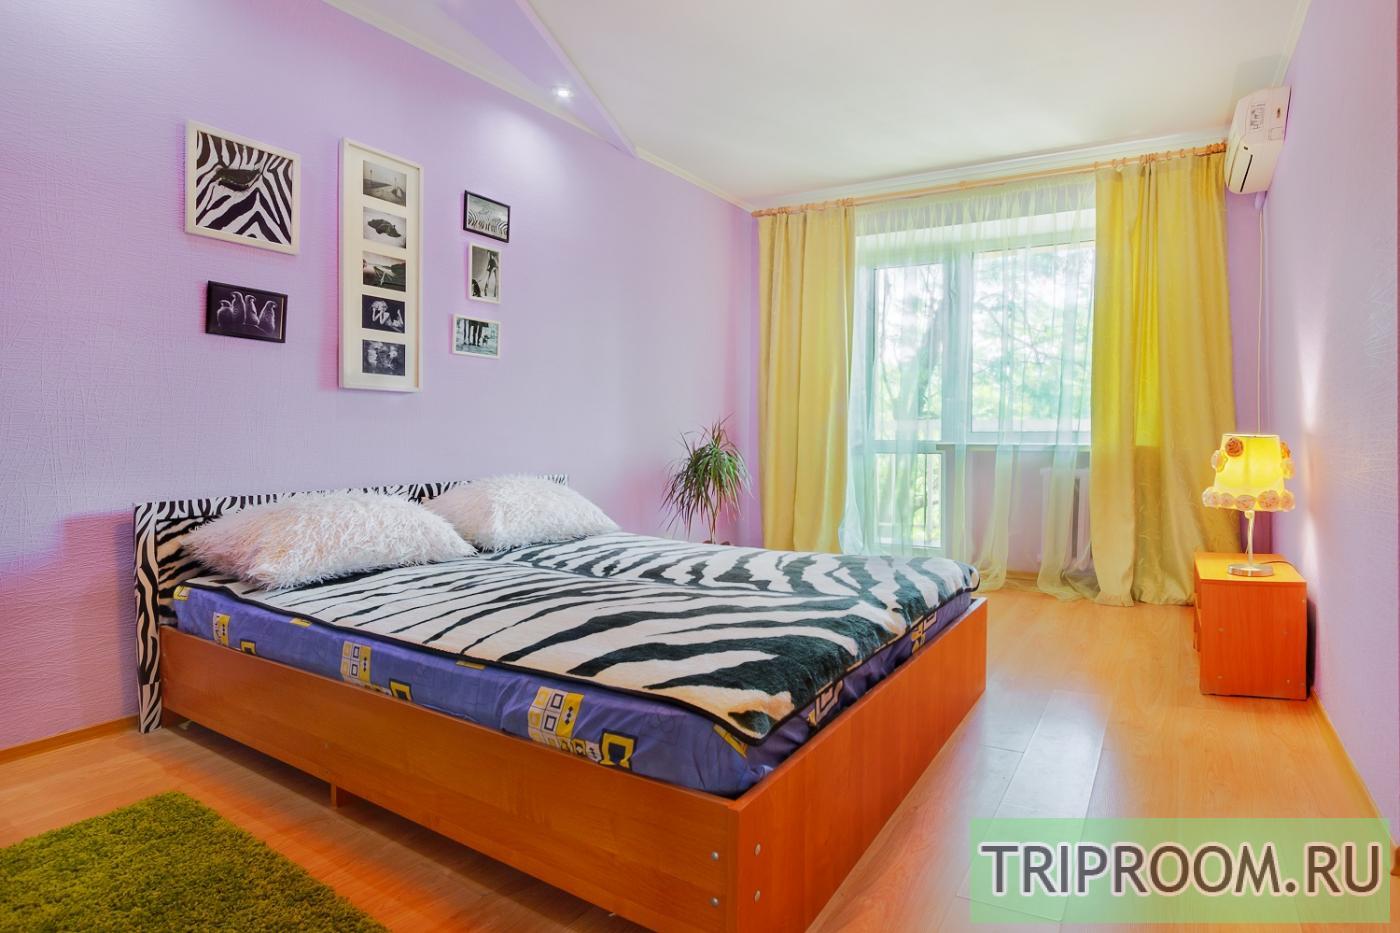 1-комнатная квартира посуточно (вариант № 11529), ул. Максима Горького улица, фото № 2